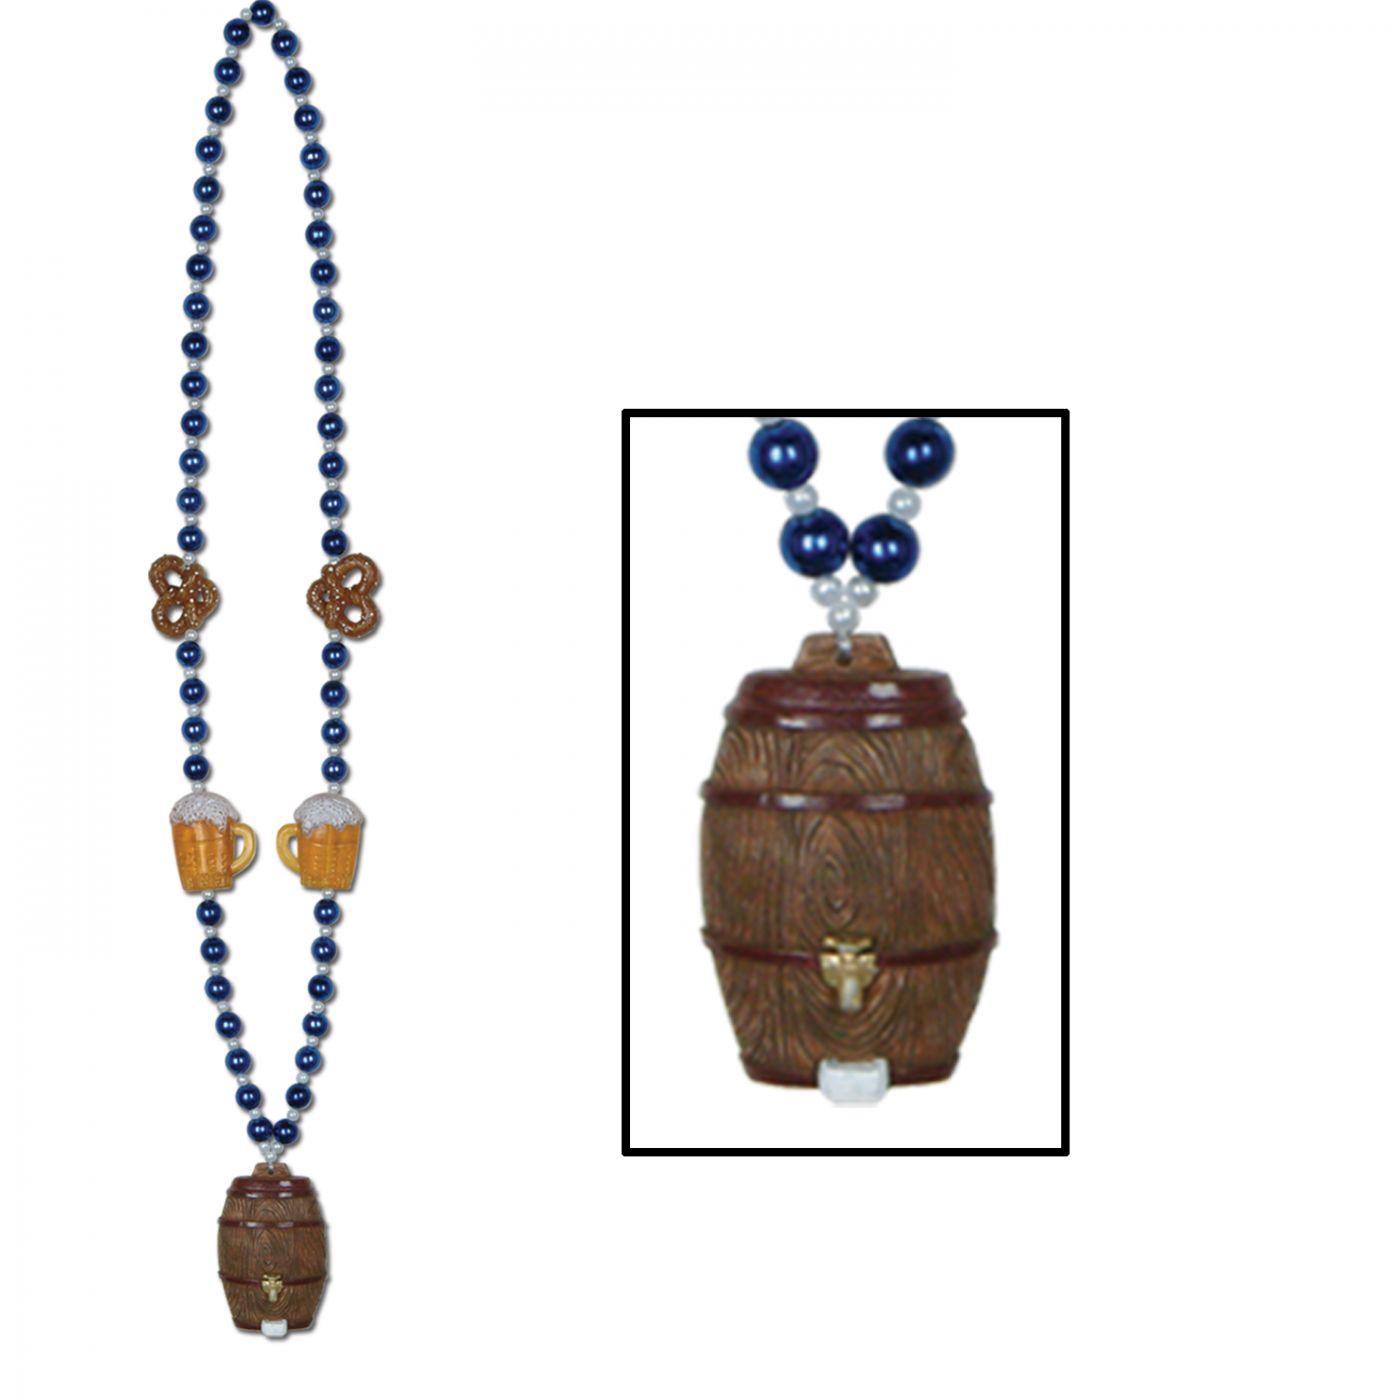 Oktoberfest Beads w/Keg Medallion image